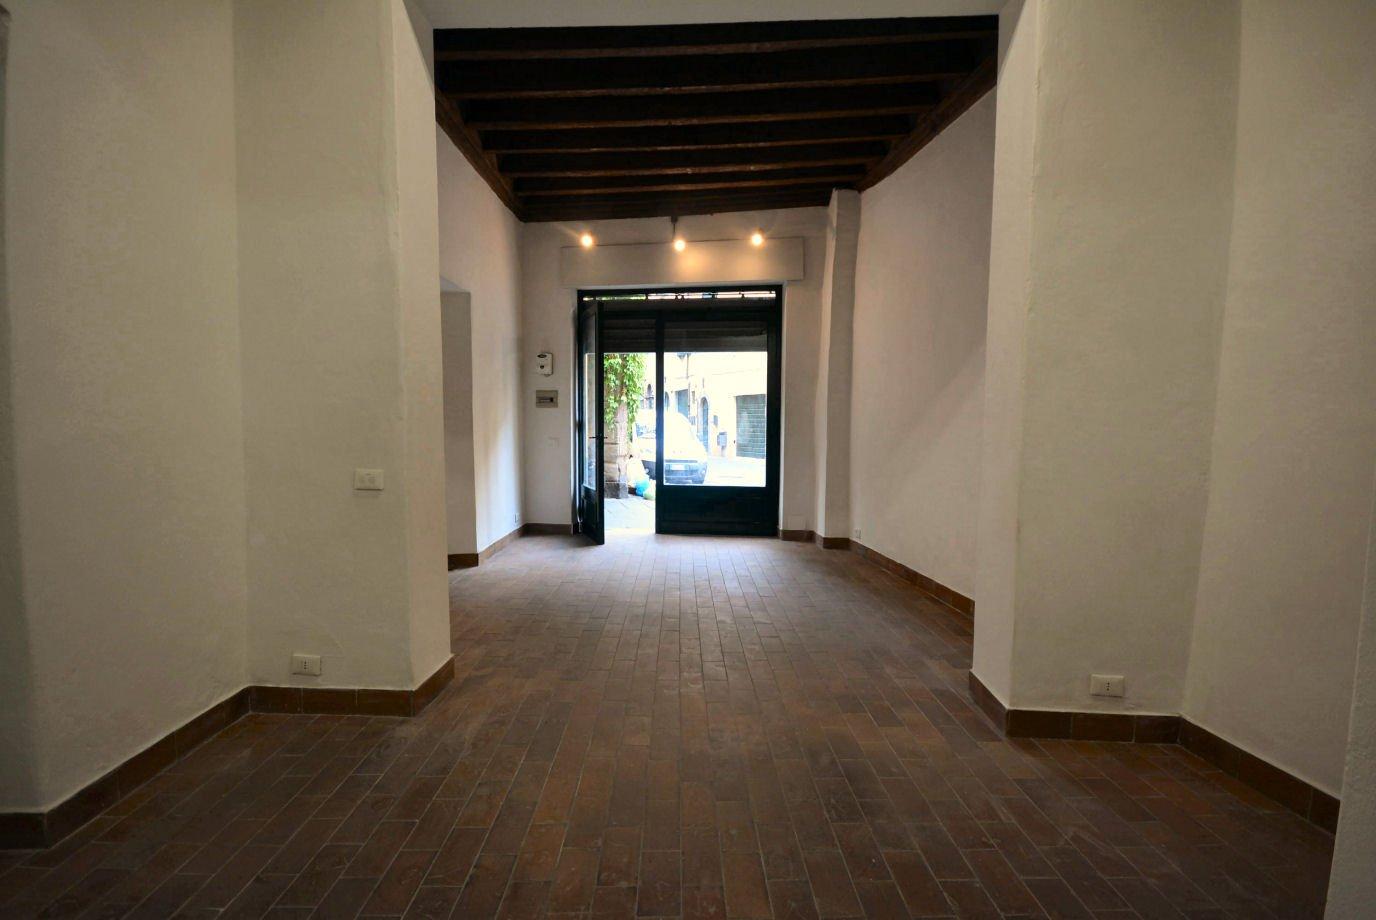 Locale comm.le/Fondo in affitto commerciale a Lucca